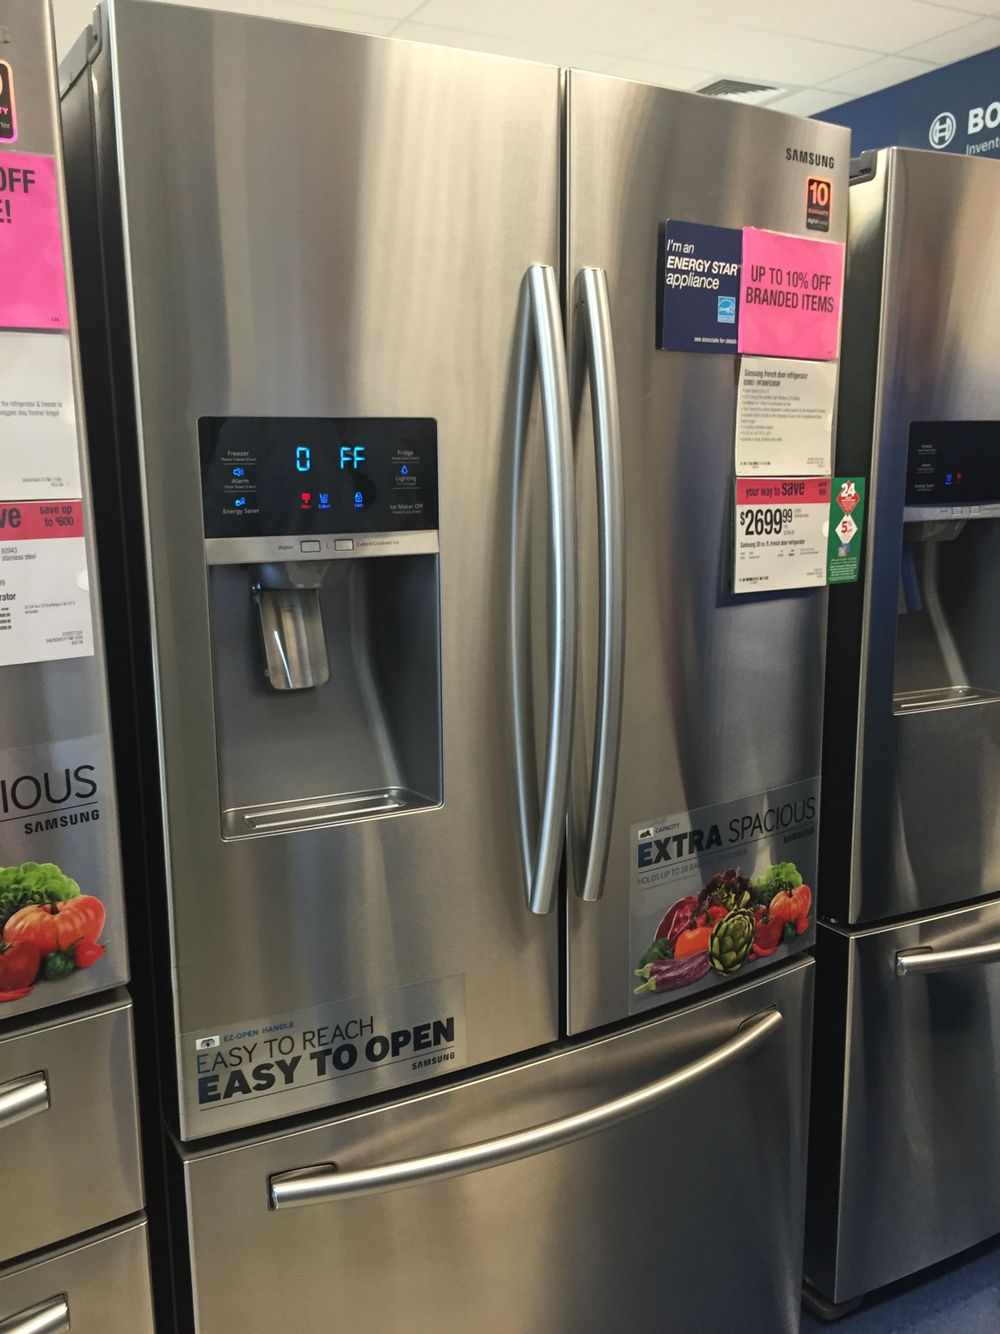 Sears More Expensive Fridge Energy Star Appliances Kitchen